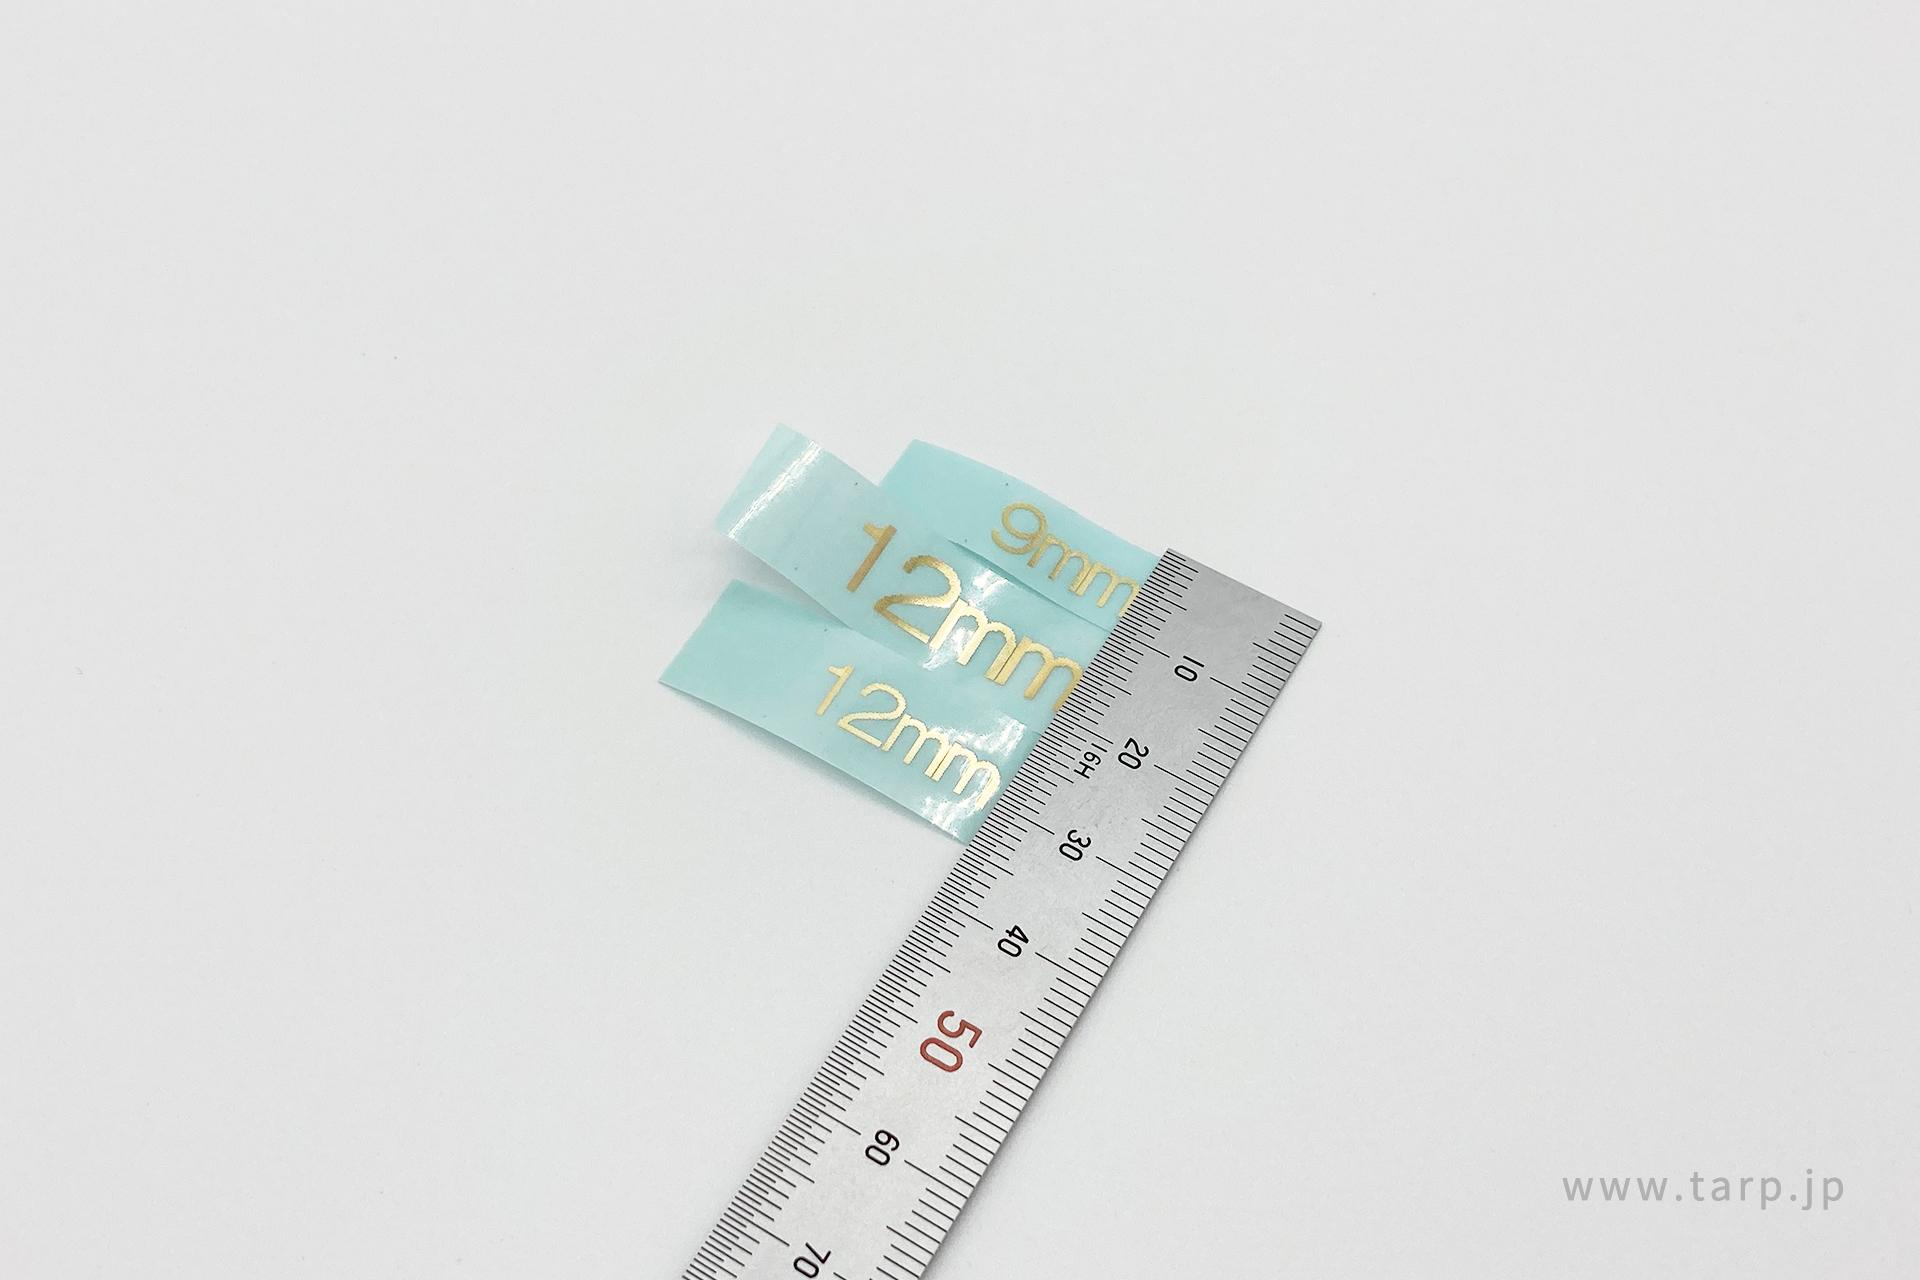 l-review-tepra-gold-ink02